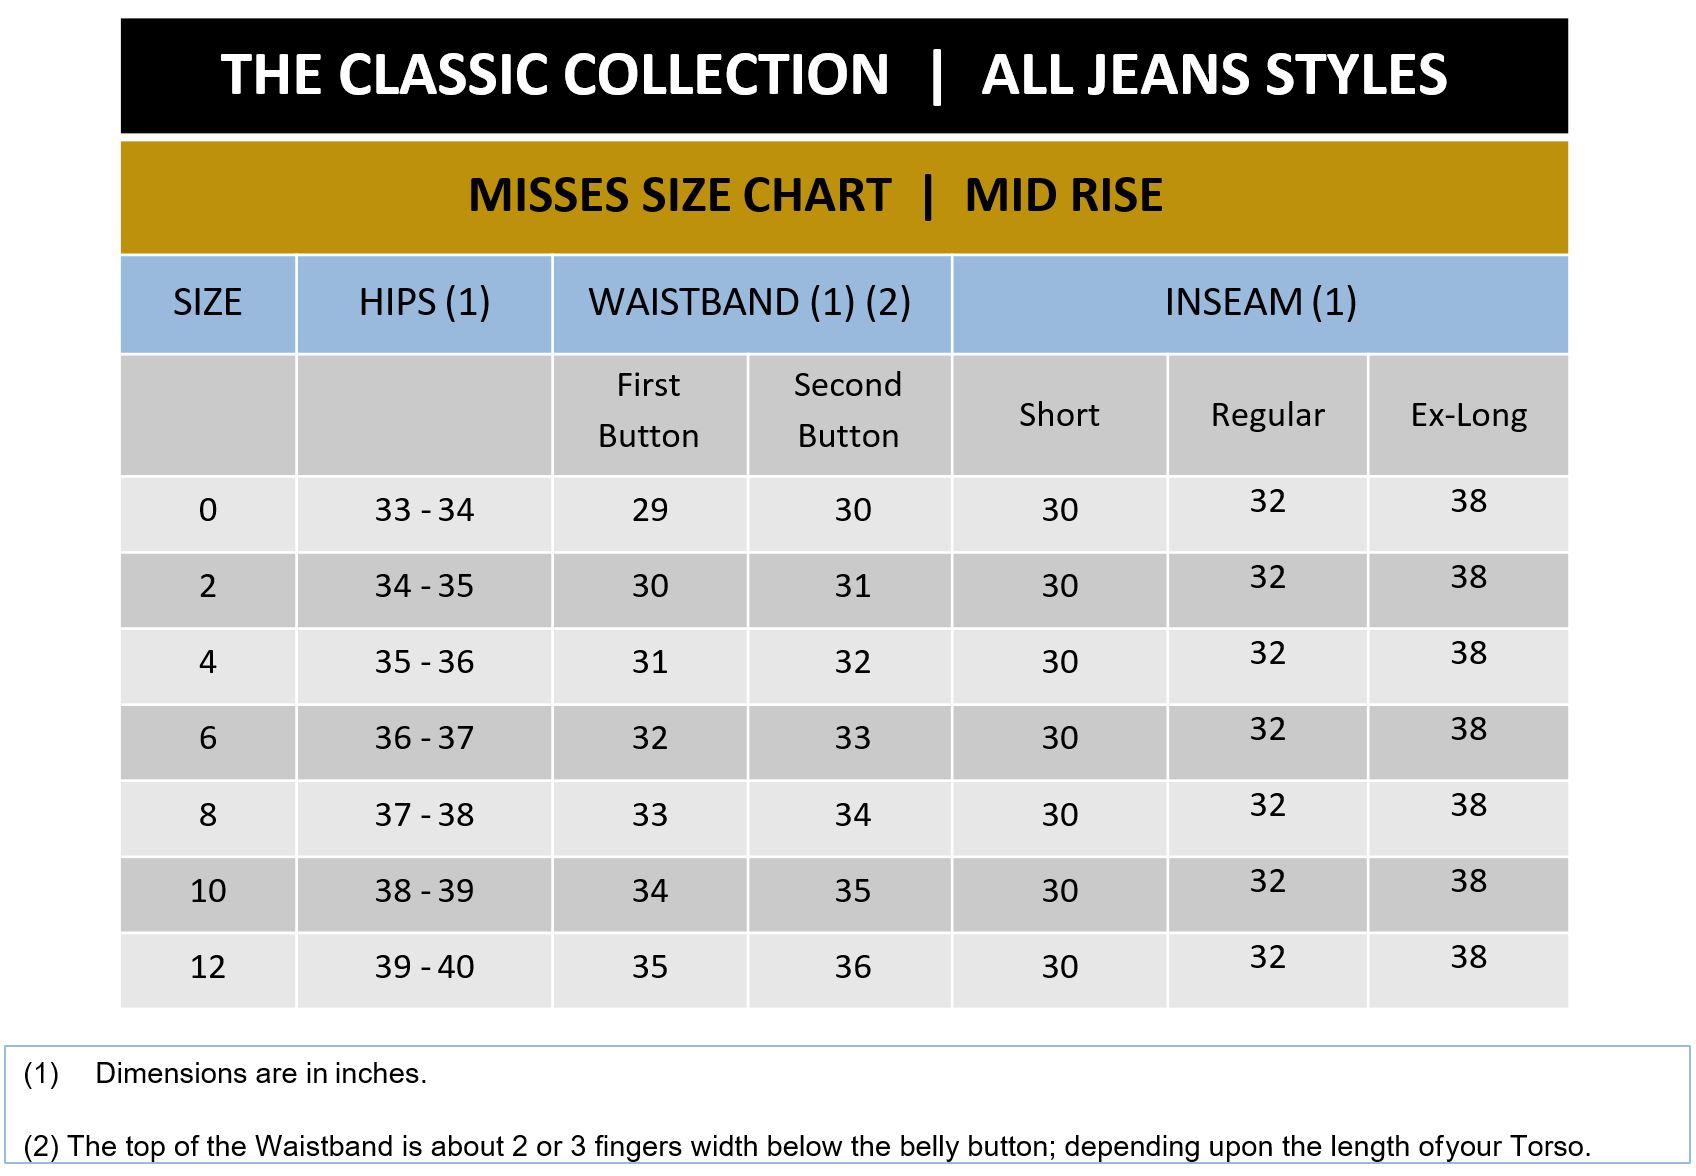 ebay.bu-denim.misses-size-charts.1feb2020.jpg